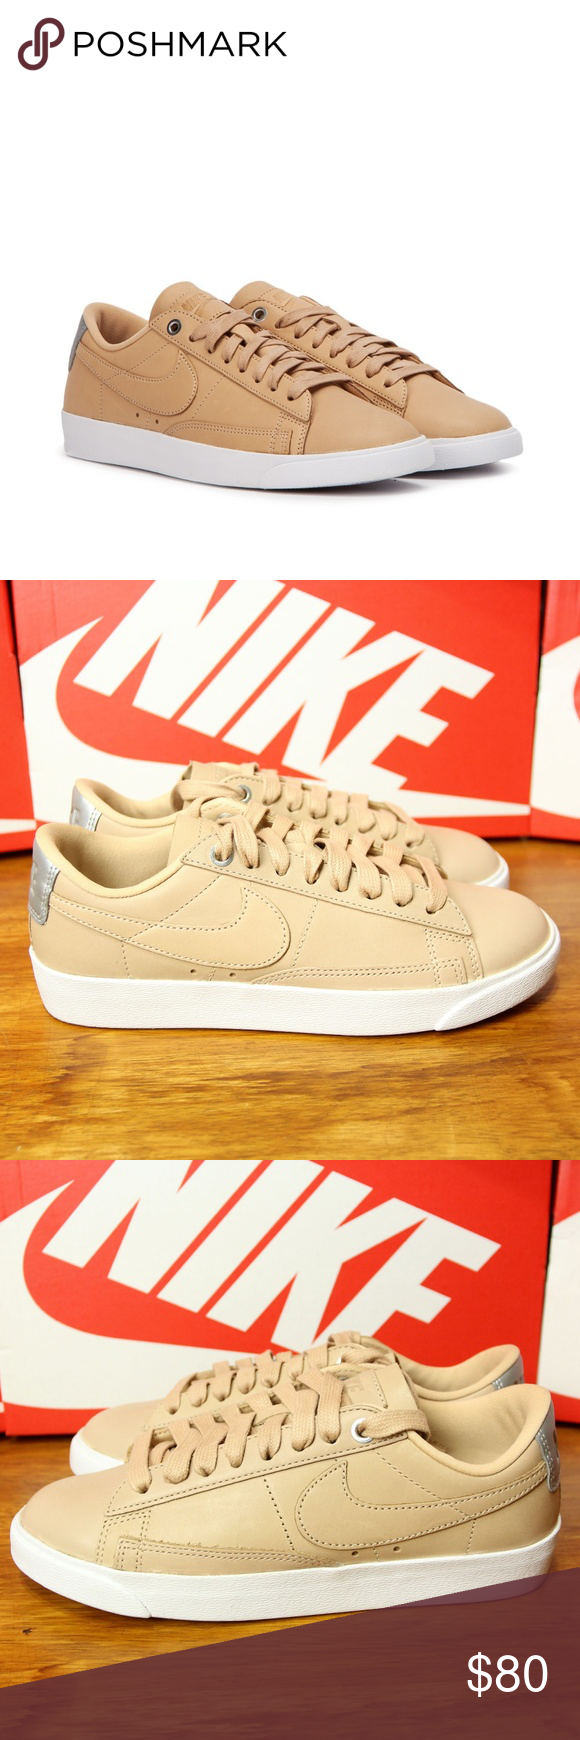 Nike Womens Blazer Low SE PRM Premium Sizes UK 4  4.5  AA1557 200